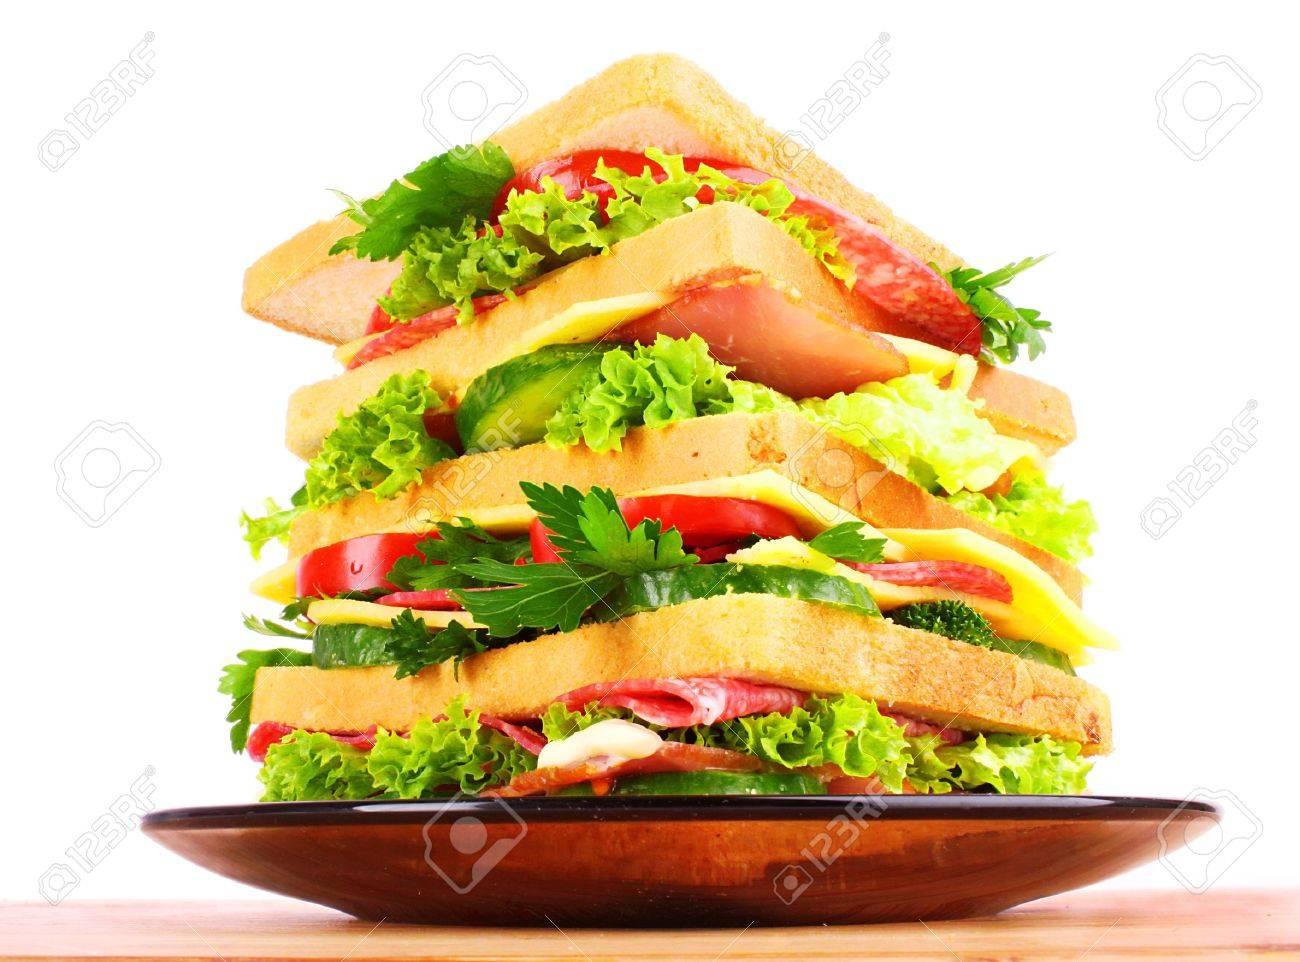 Huge sandwich on white background Stock Photo - 9774991